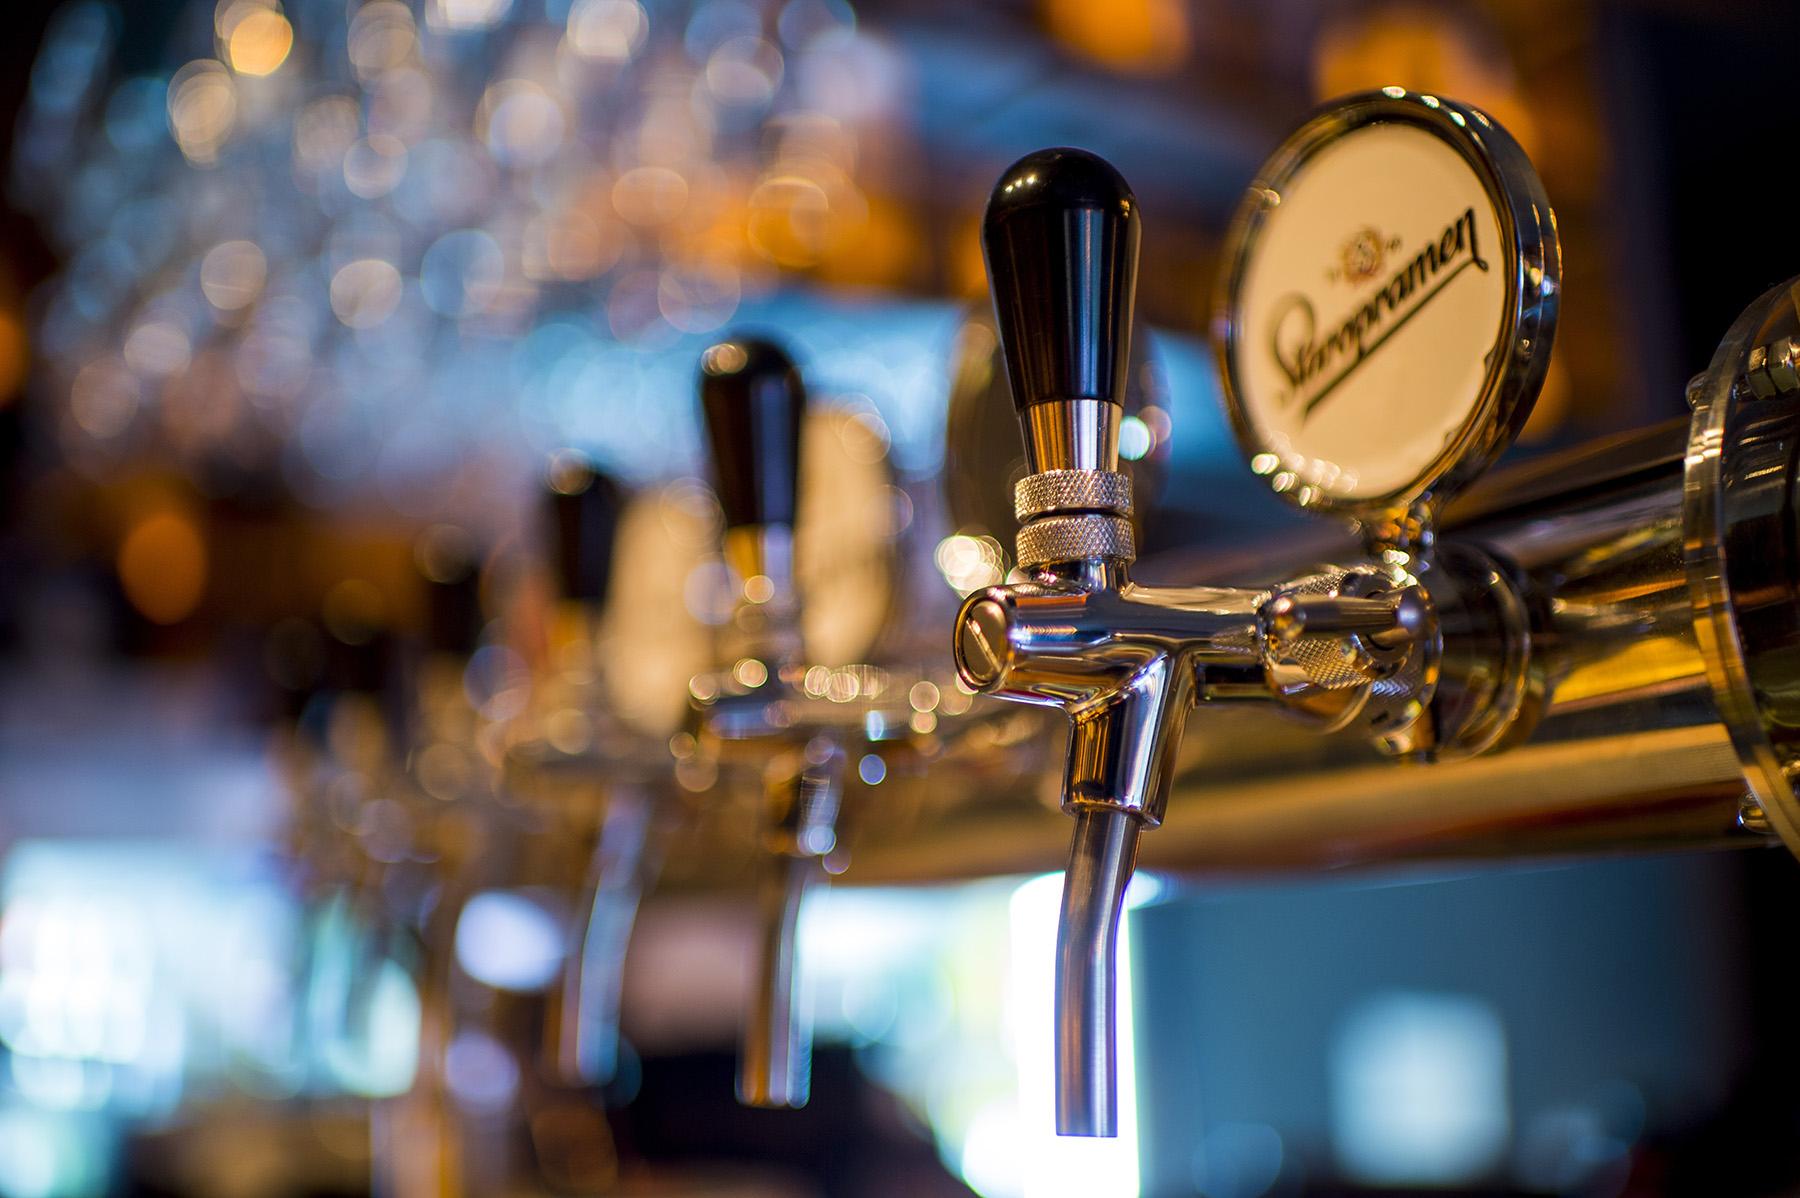 beer pumps in a bar